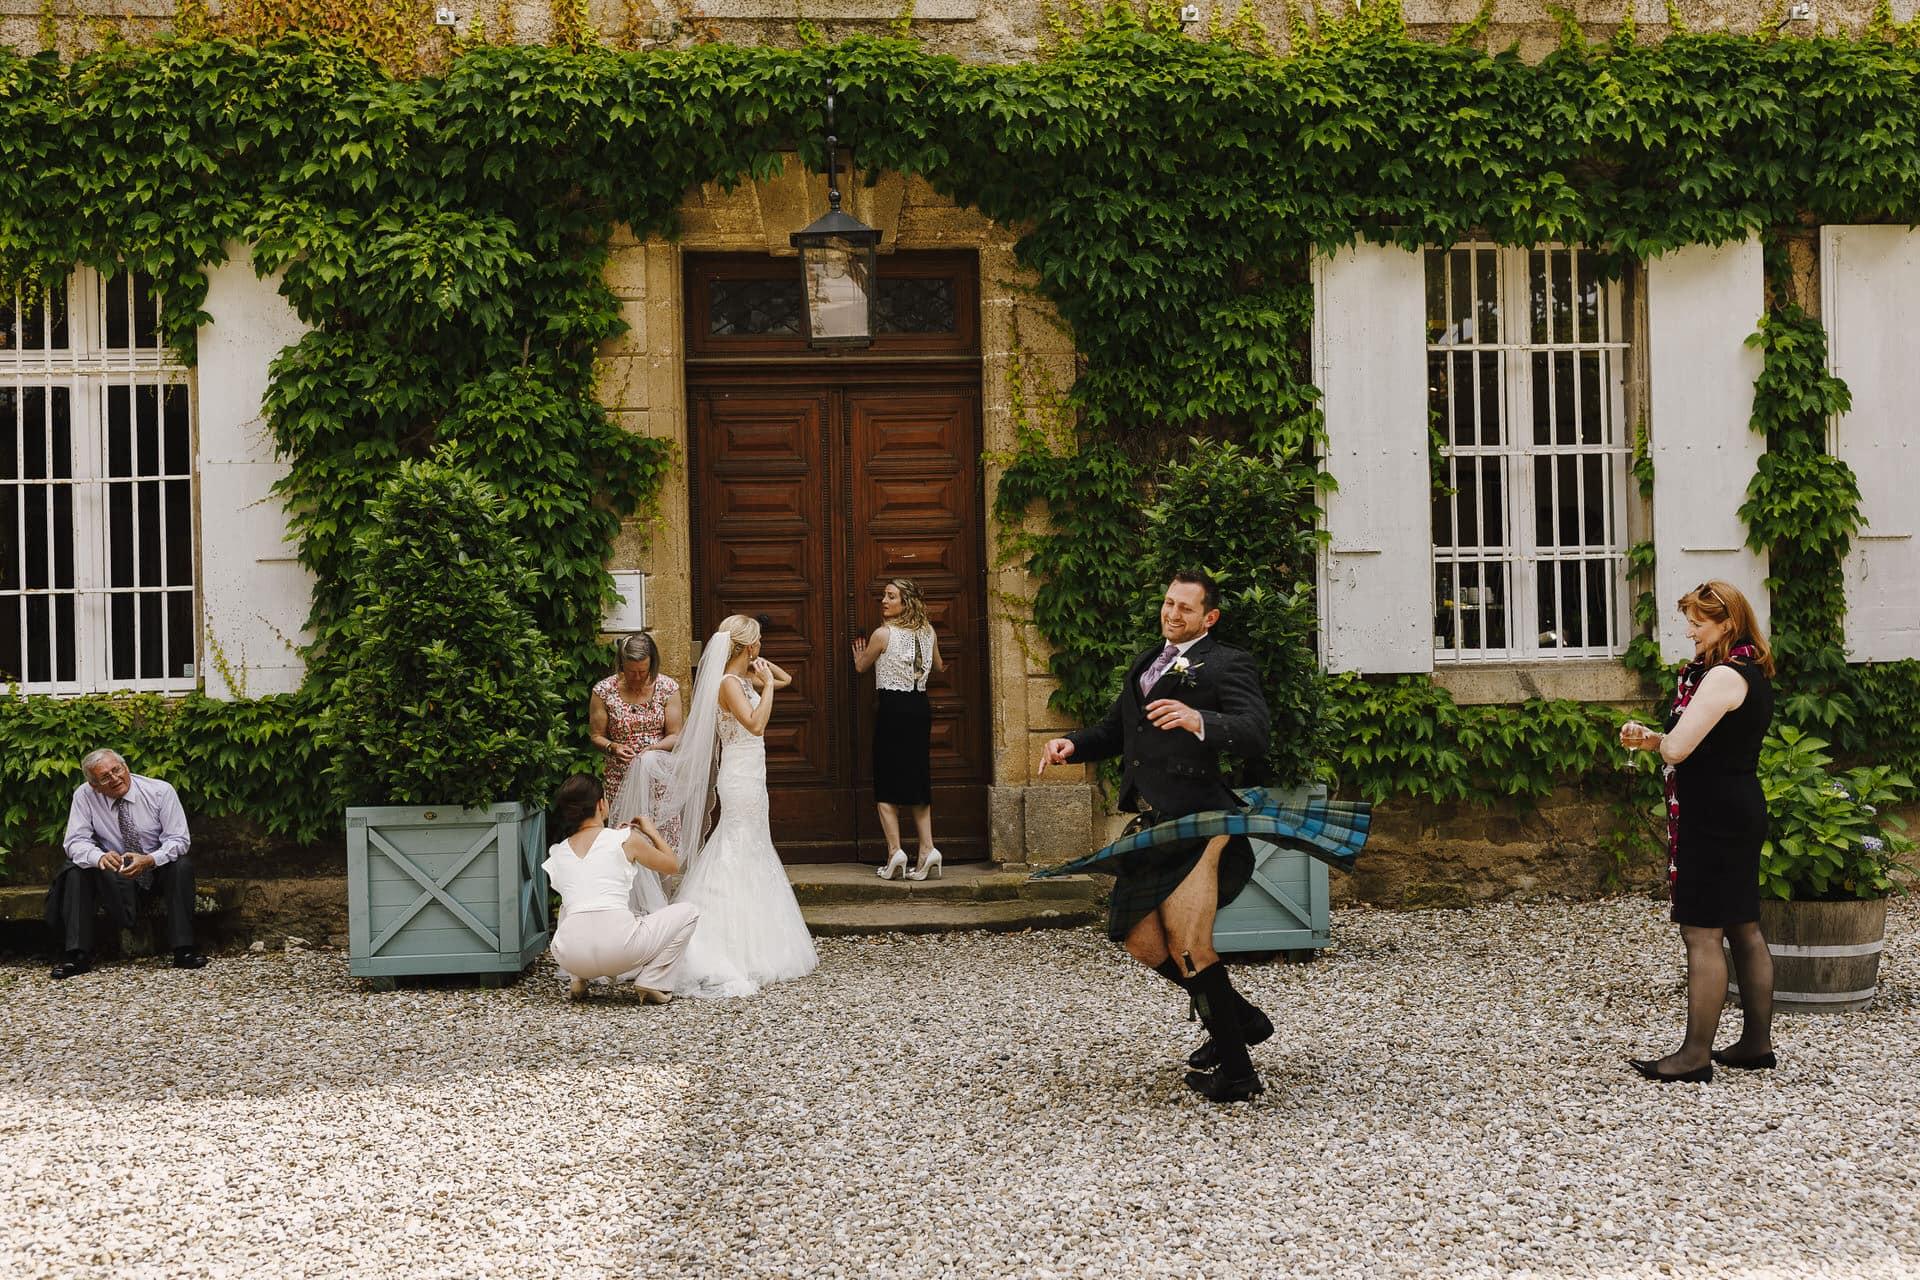 Nadine van Biljon Photography Top London Wedding Photographer South of France Wedding Photographer Chateau de BlomacA